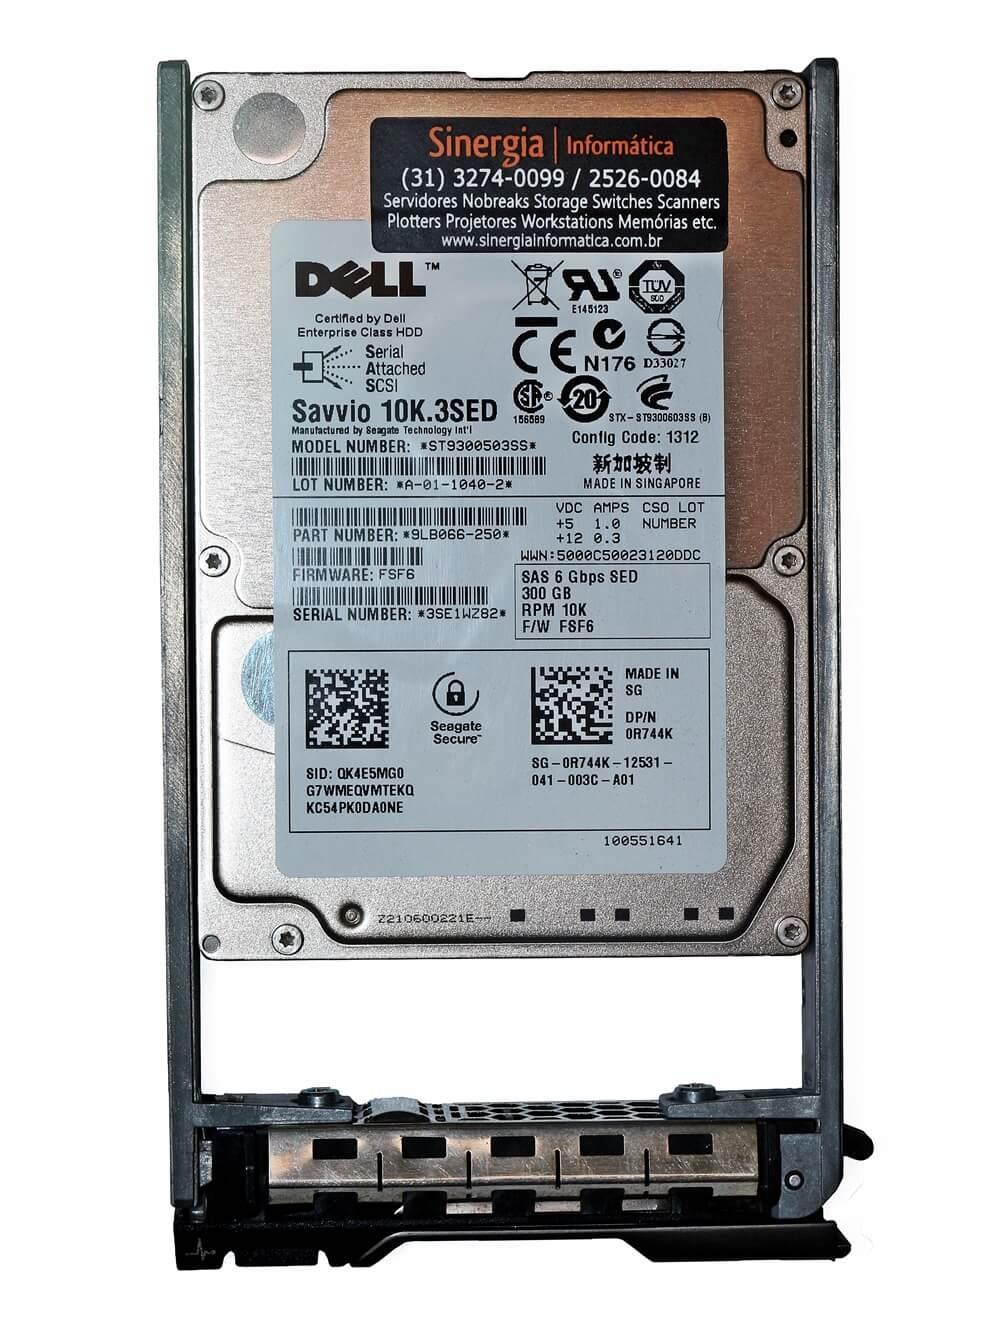 ST9300503SS HD Dell 300GB SAS Savvio 10K.3SED 6Gbps para Servidor R410 R510 R610 R710 R810 R815 em estoque